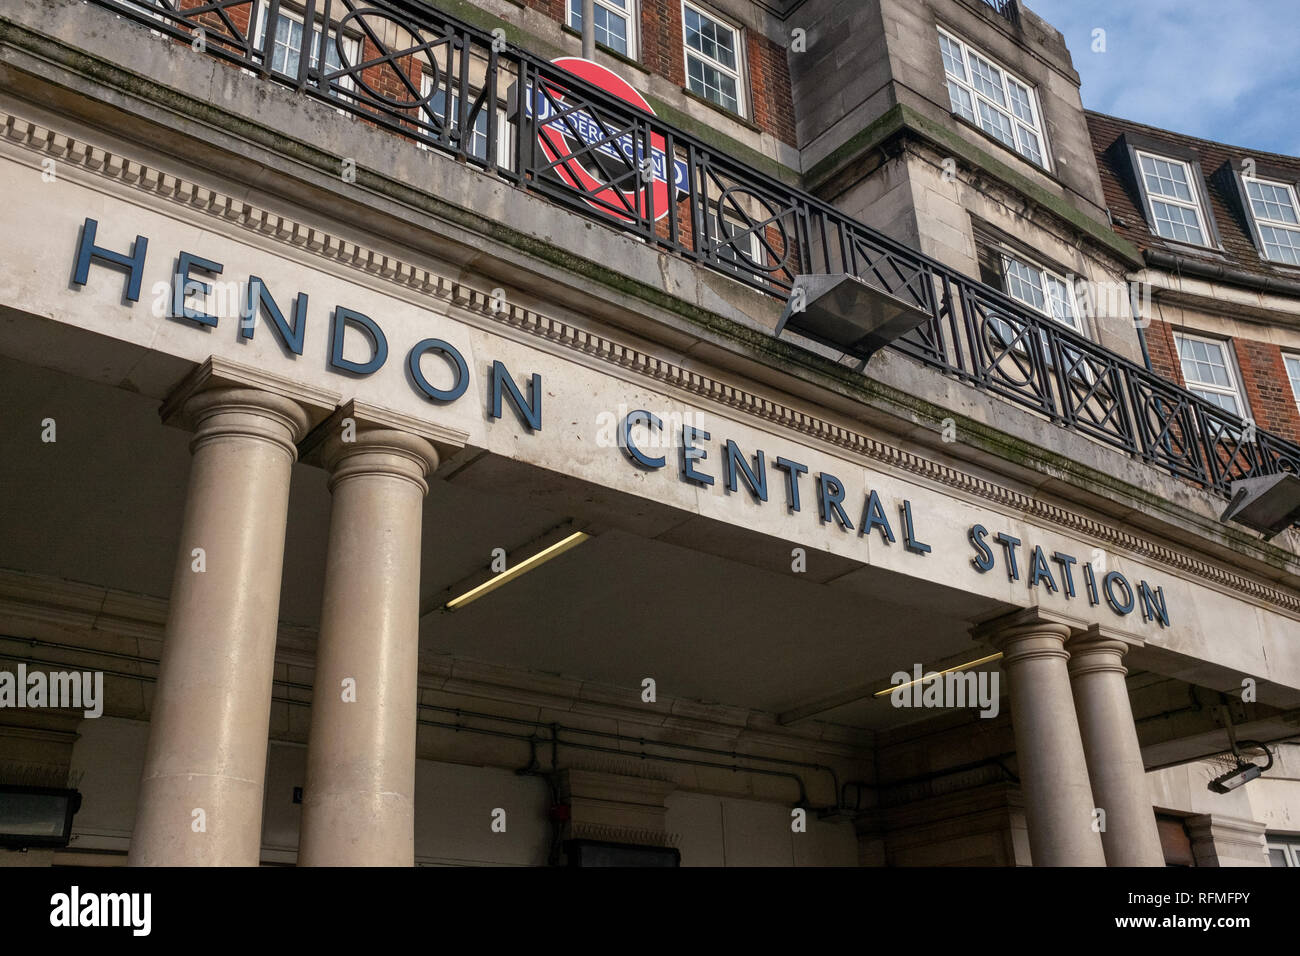 Hendon Stock Photos & Hendon Stock Images - Alamy